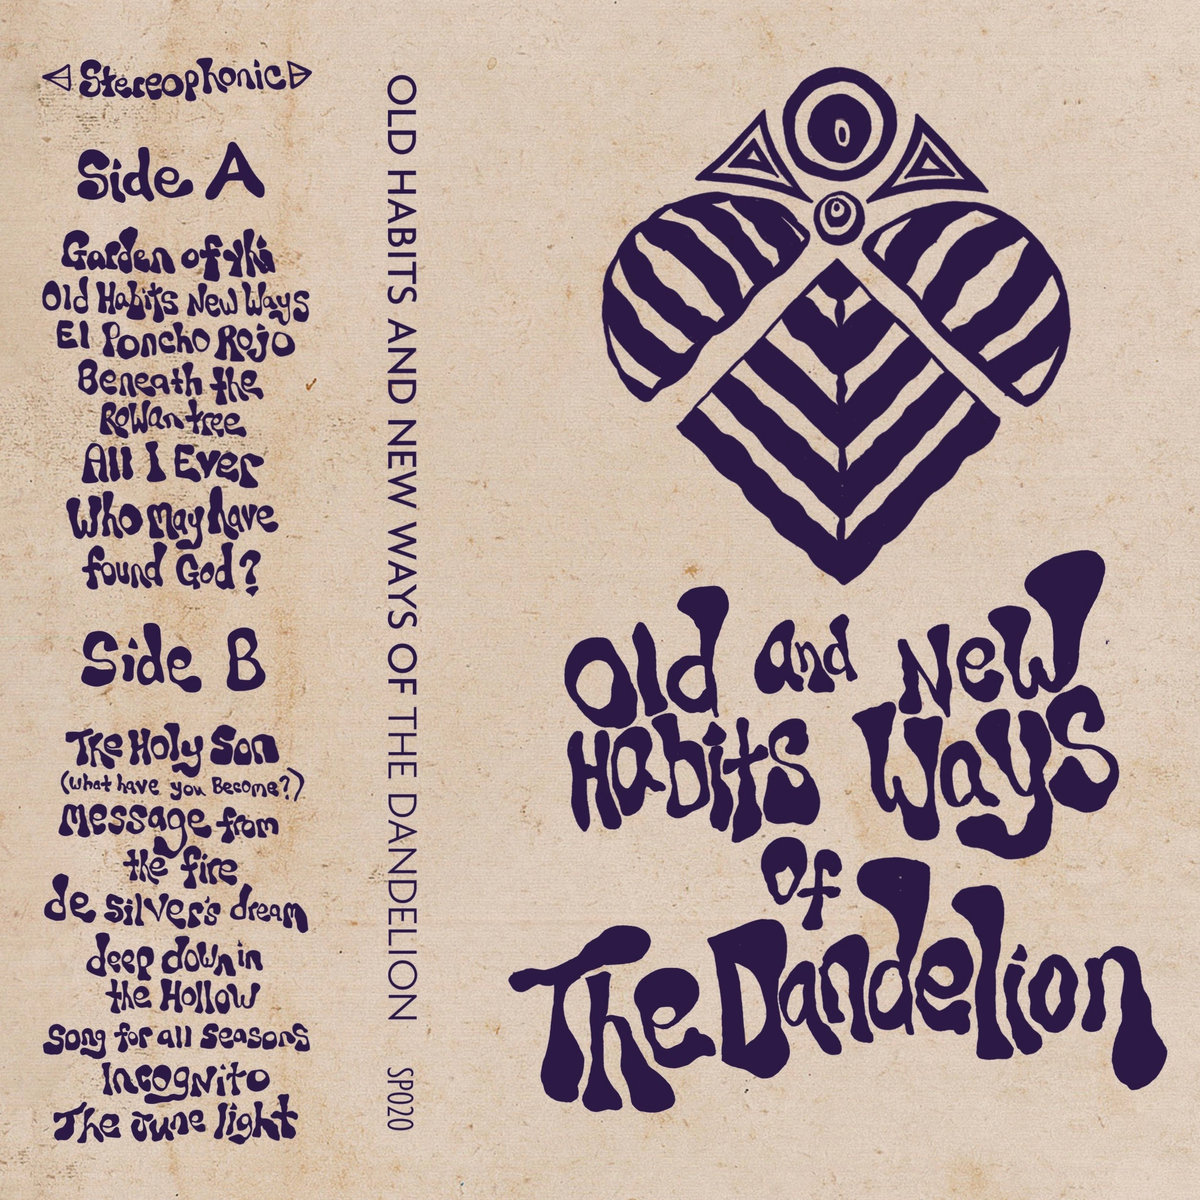 The Dandelion - Old Habits & New Ways of The Dandelion